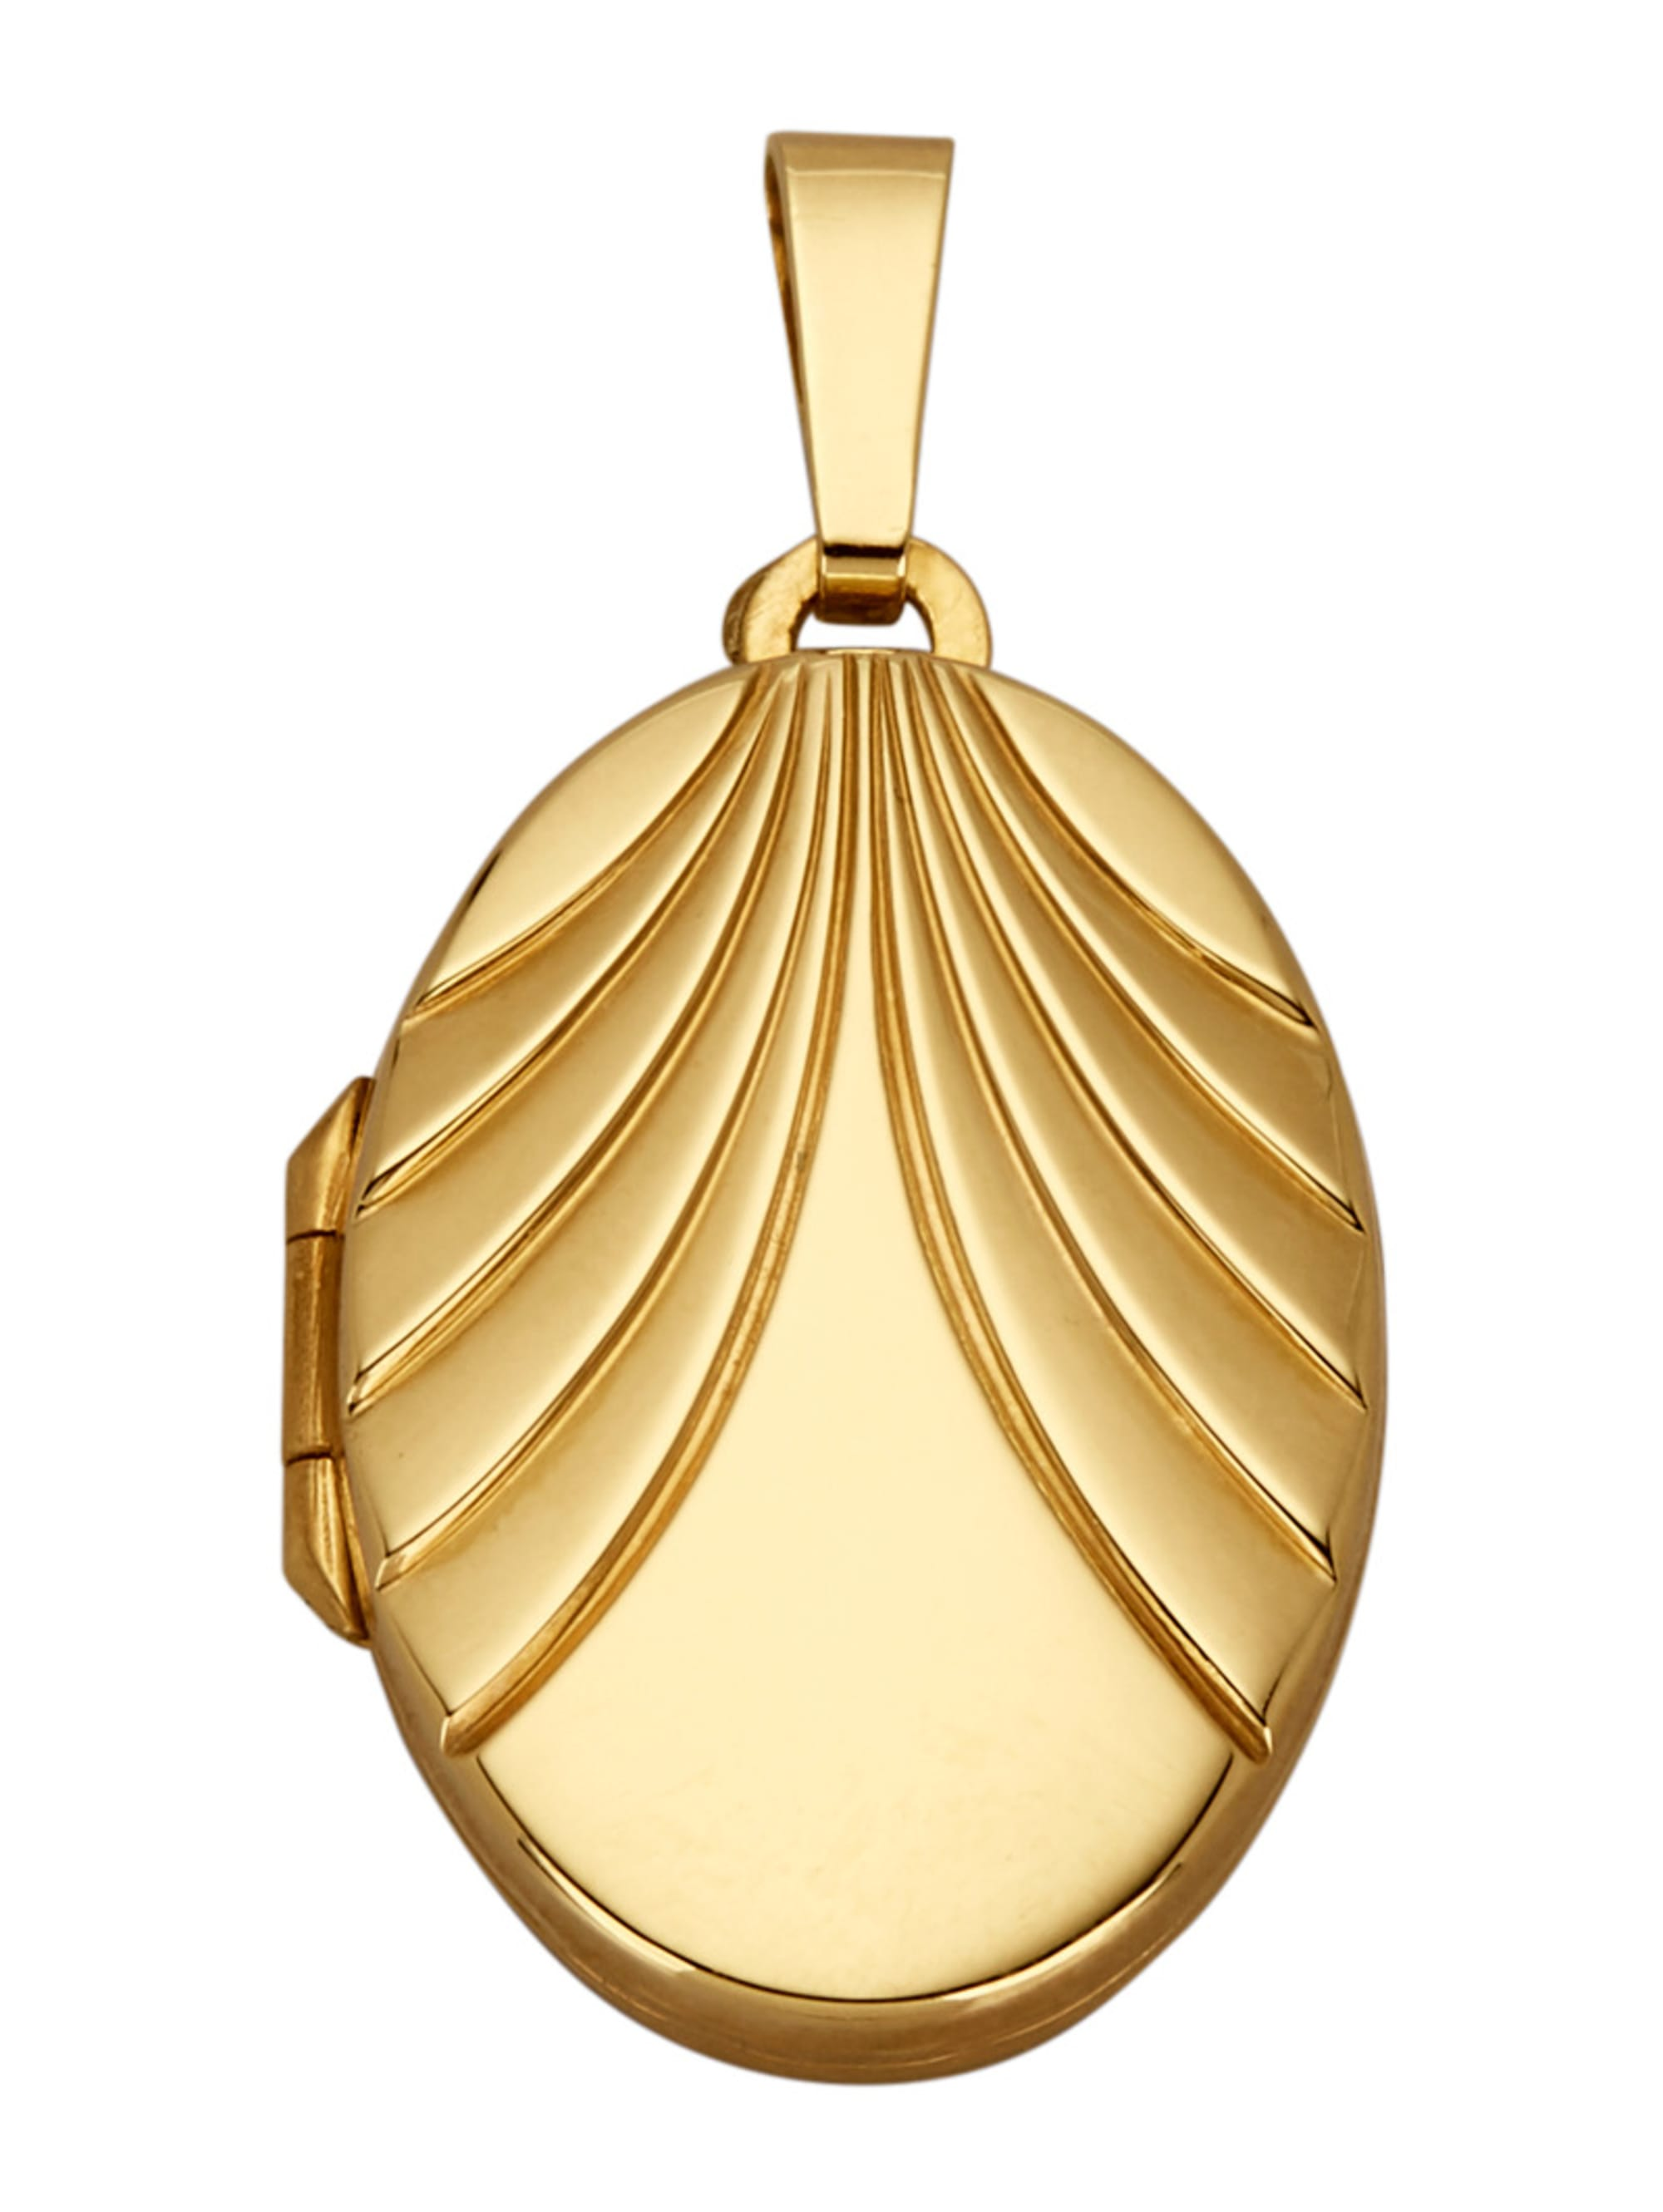 Diemer Gold Medaillon-Anhänger qXwqj